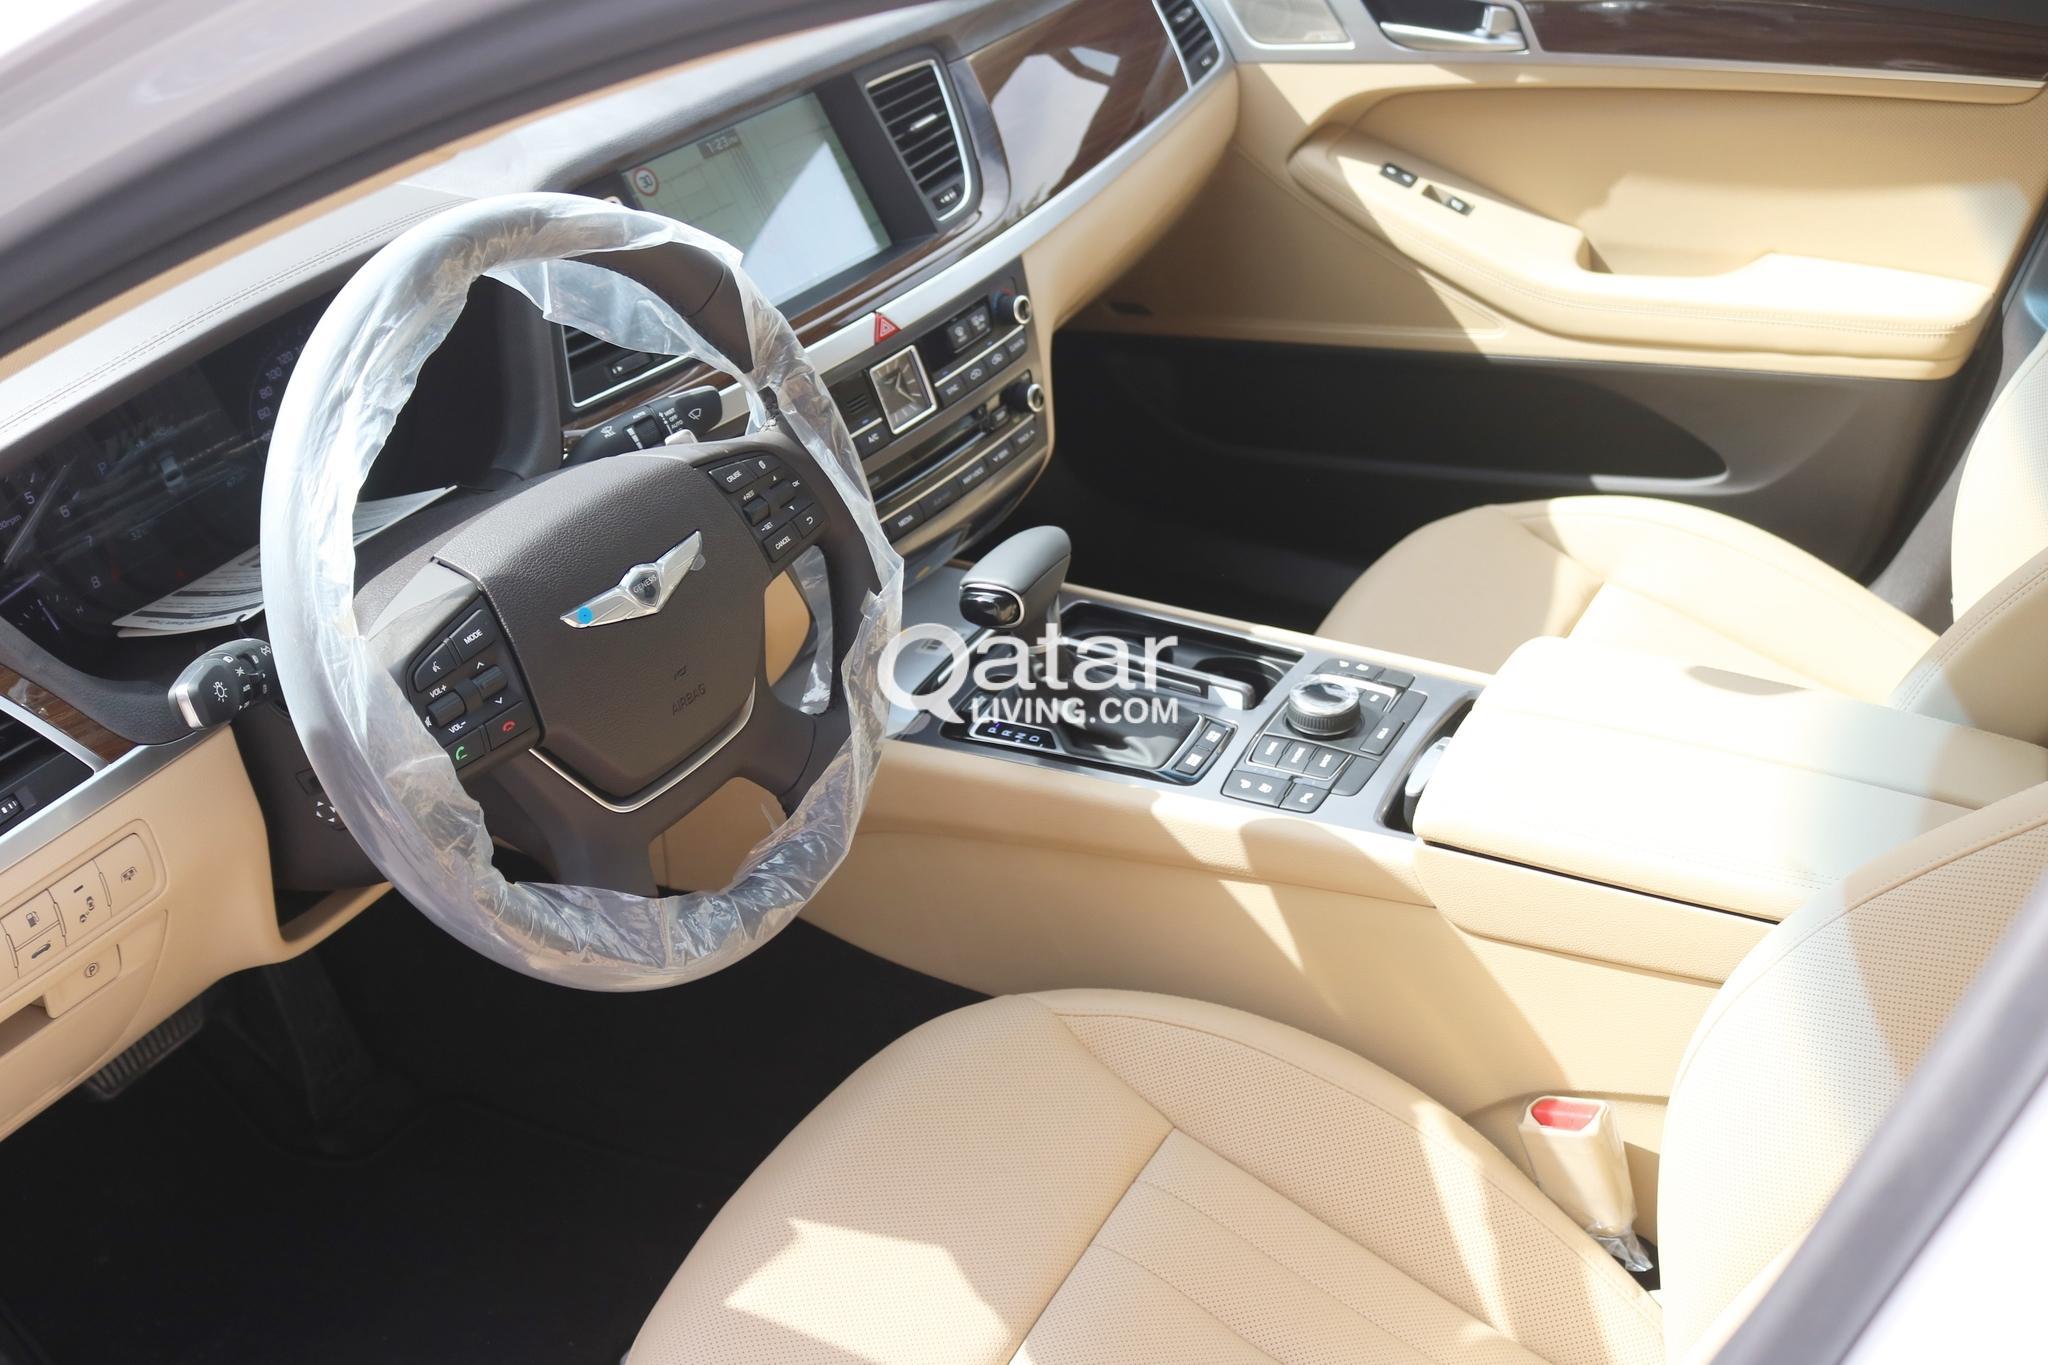 GENESIS  G80  3.8 L  - 311 hp ( Full options )